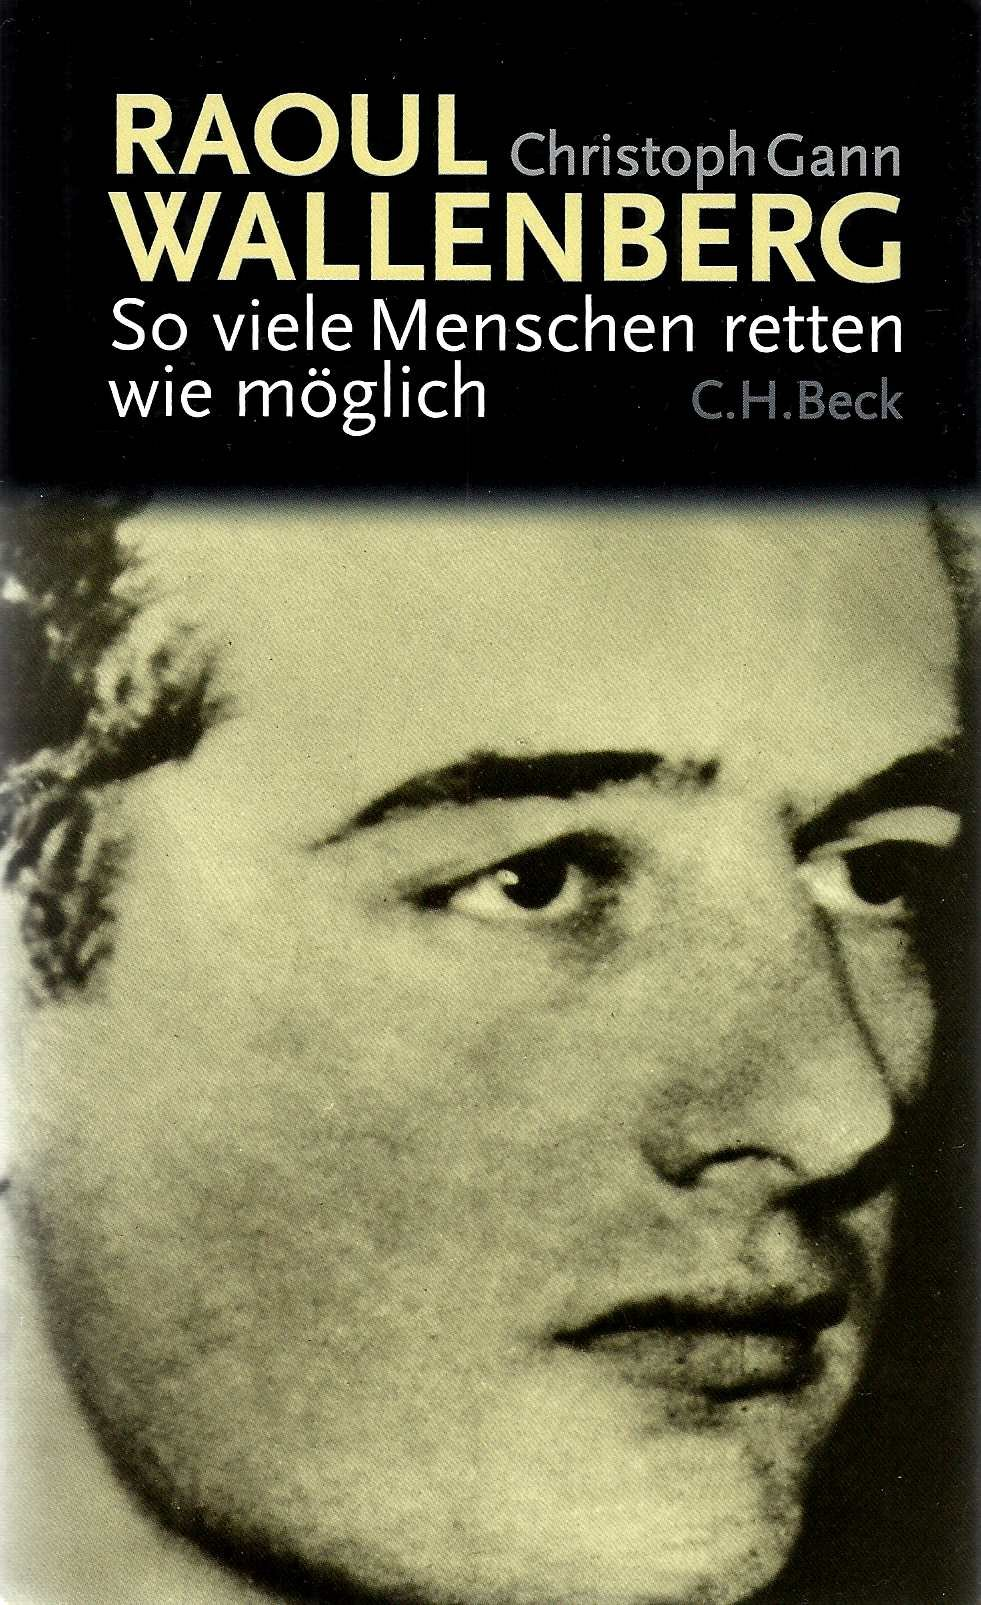 raoul-wallenberg-so-viele-menschen-retten-wie-mglich